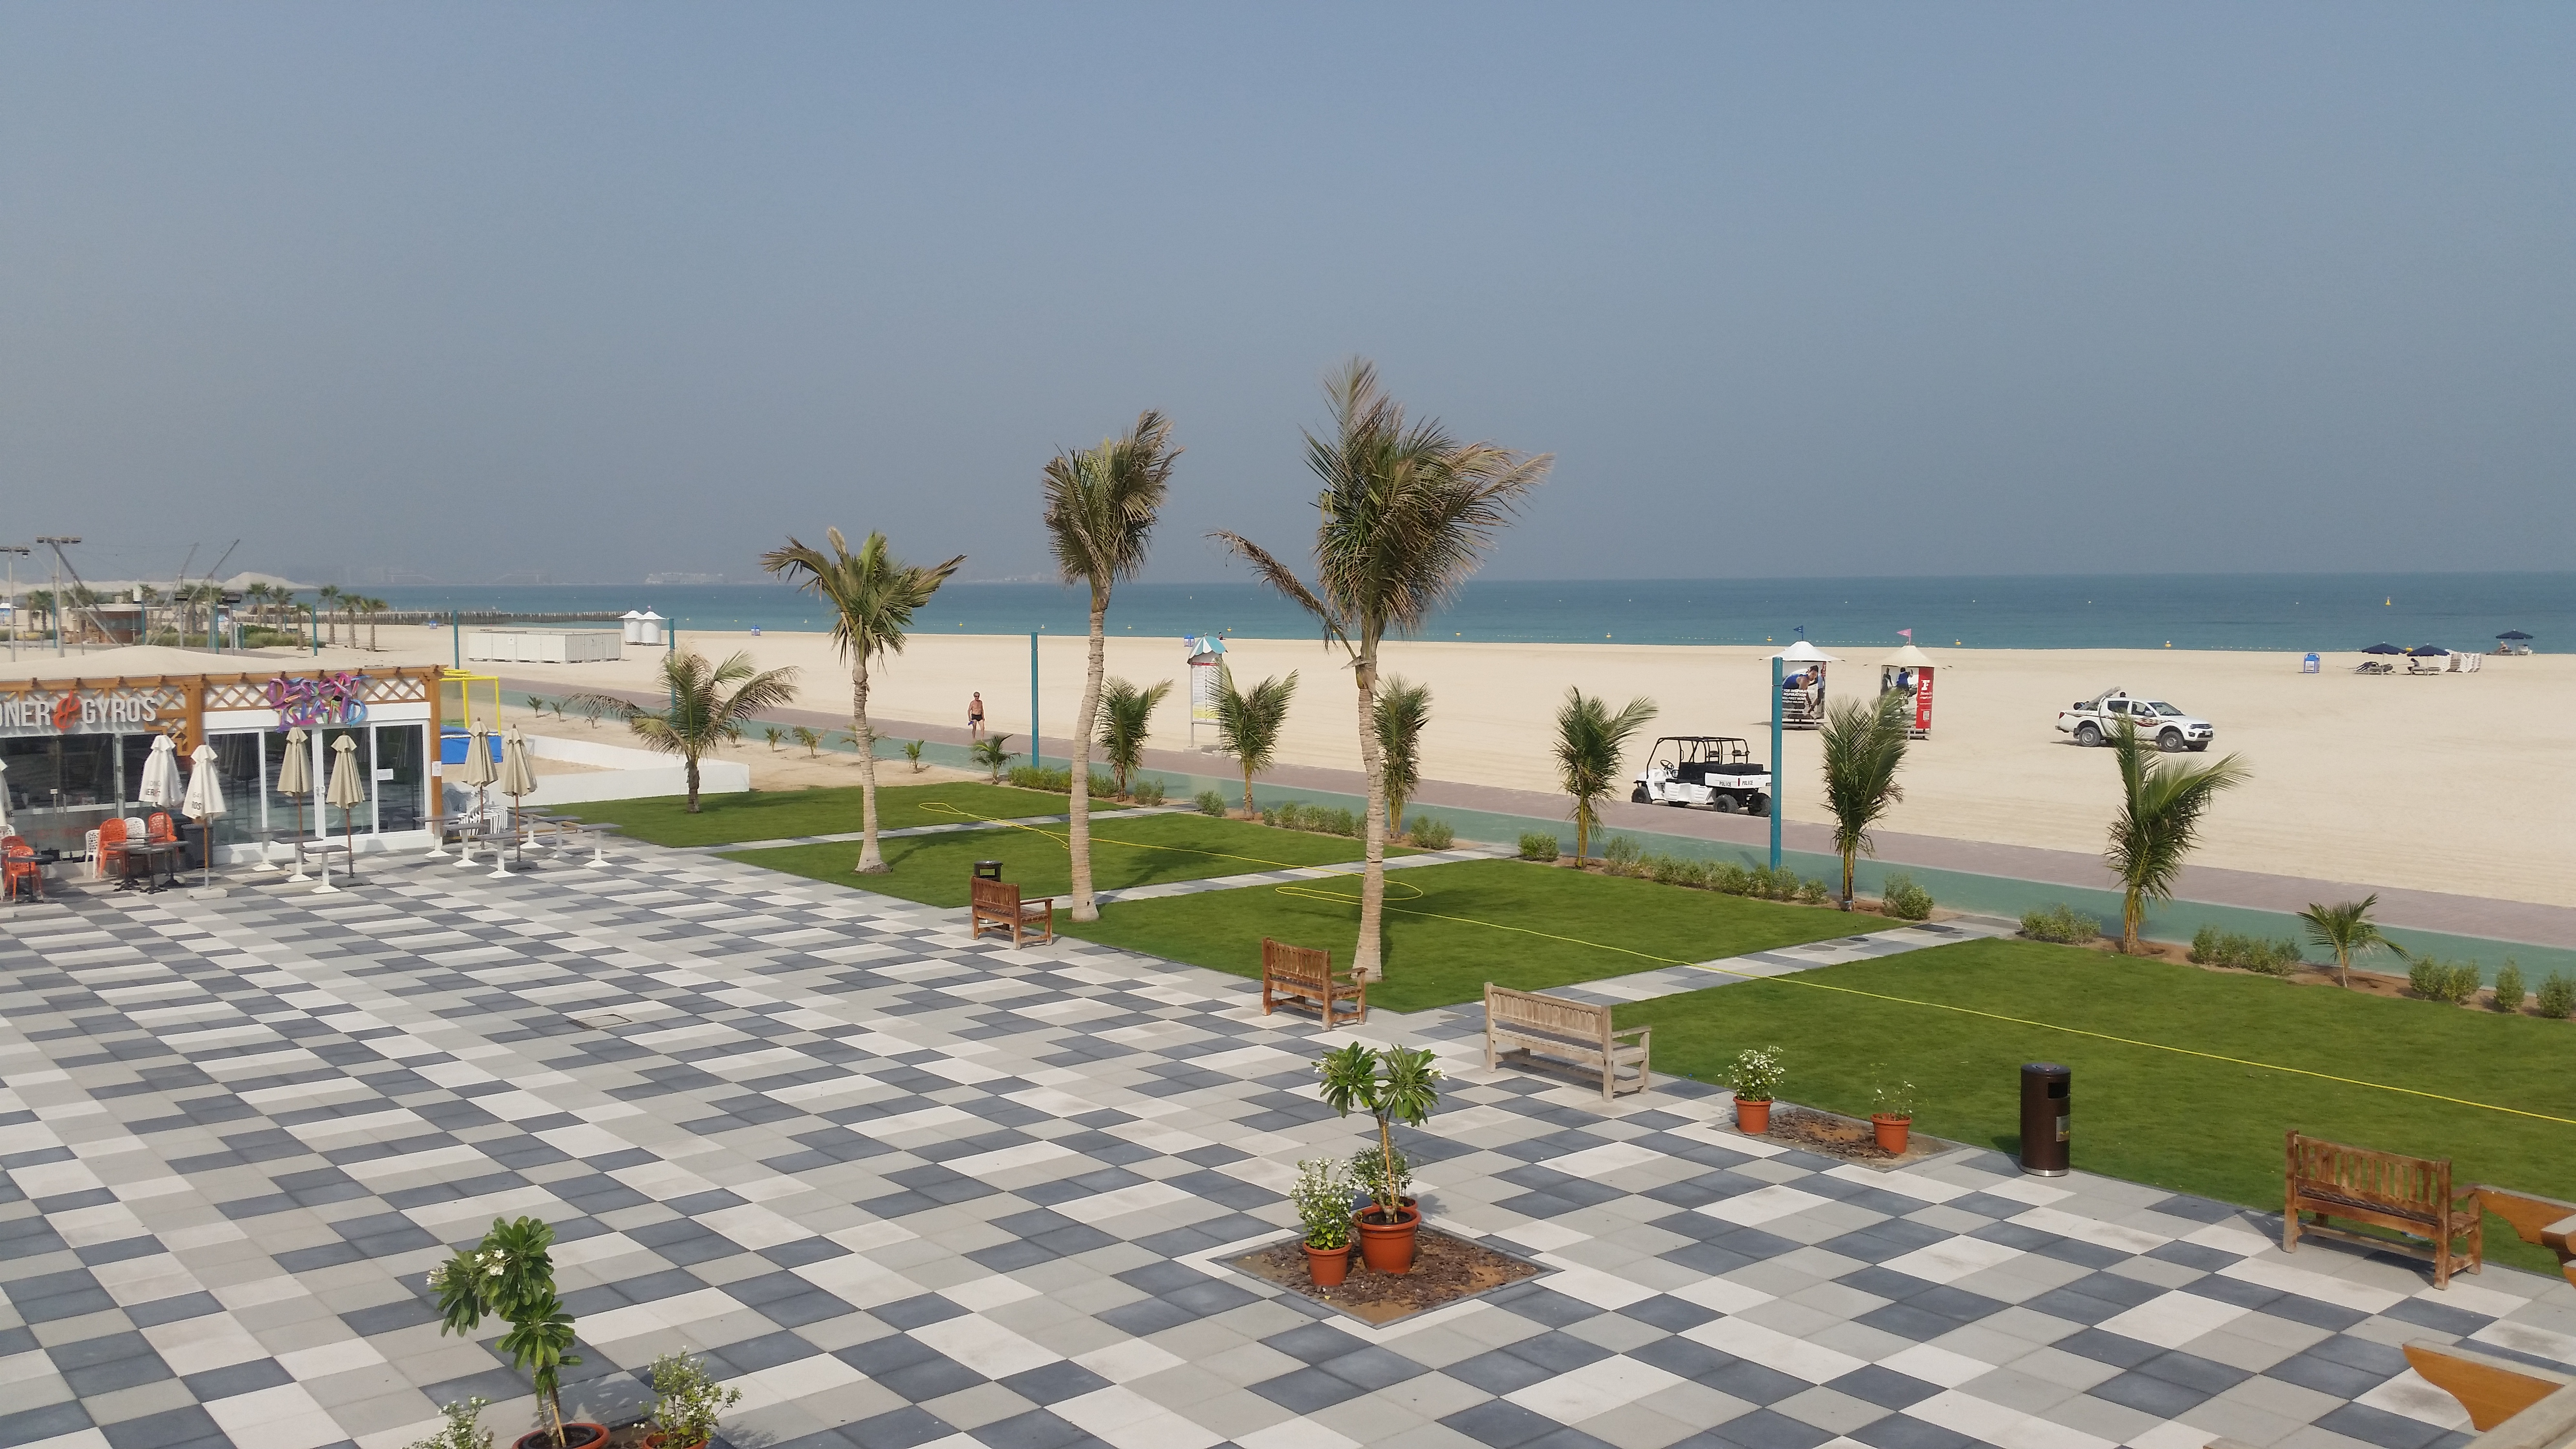 Photo of شاطئ كايت يستضيف الحدث حملة بصحة وعافية التي أطلقها برجمان